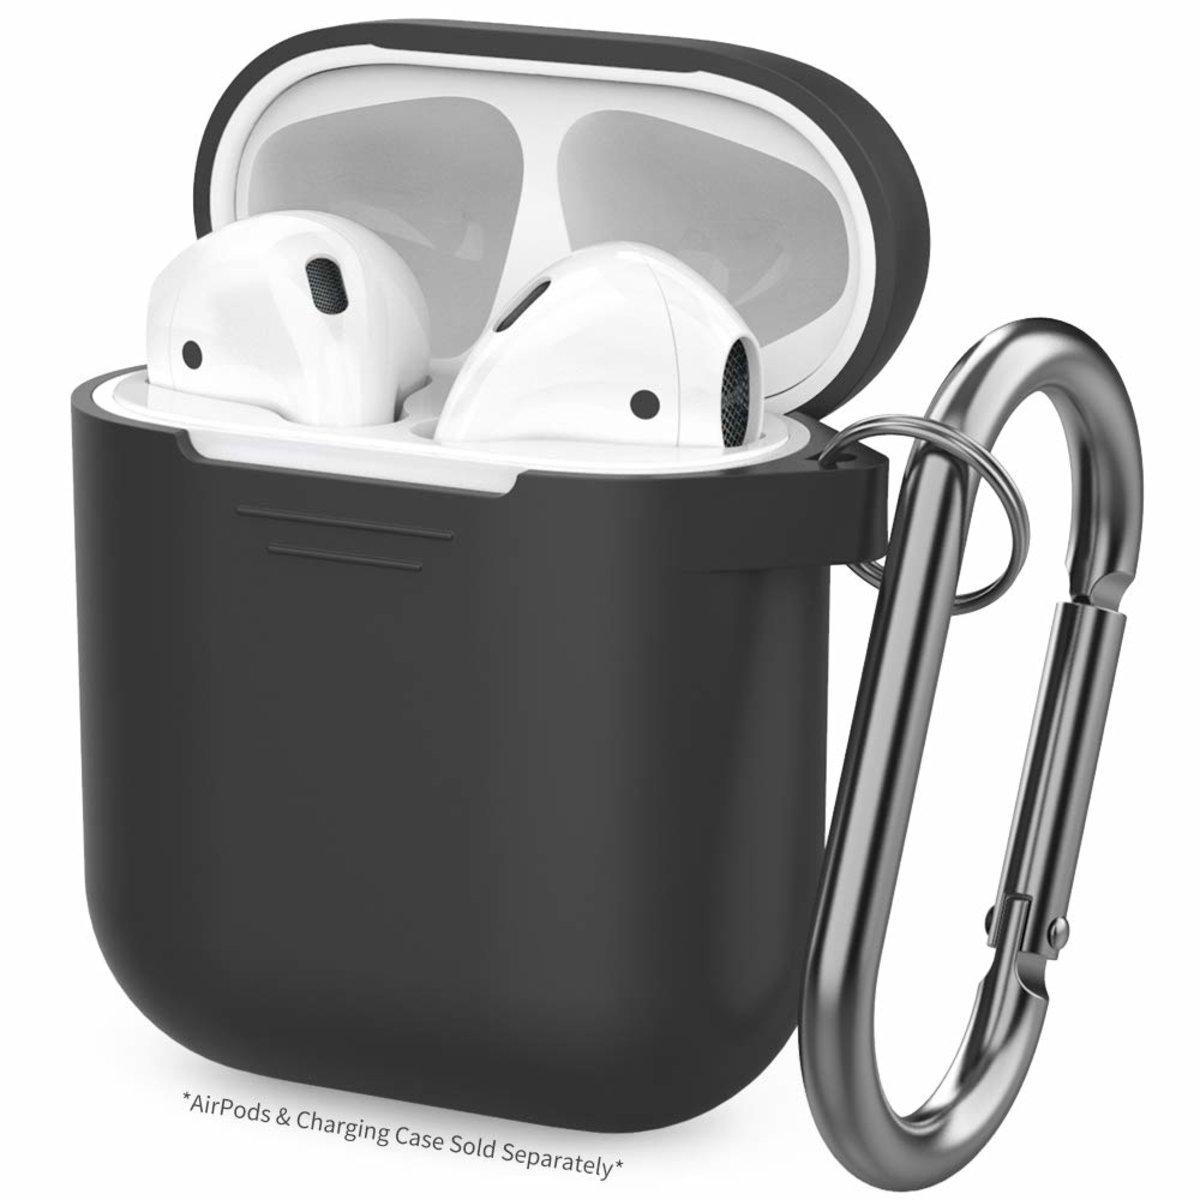 PodFit 2 代AirPods 充電盒矽膠保護殼 黑色